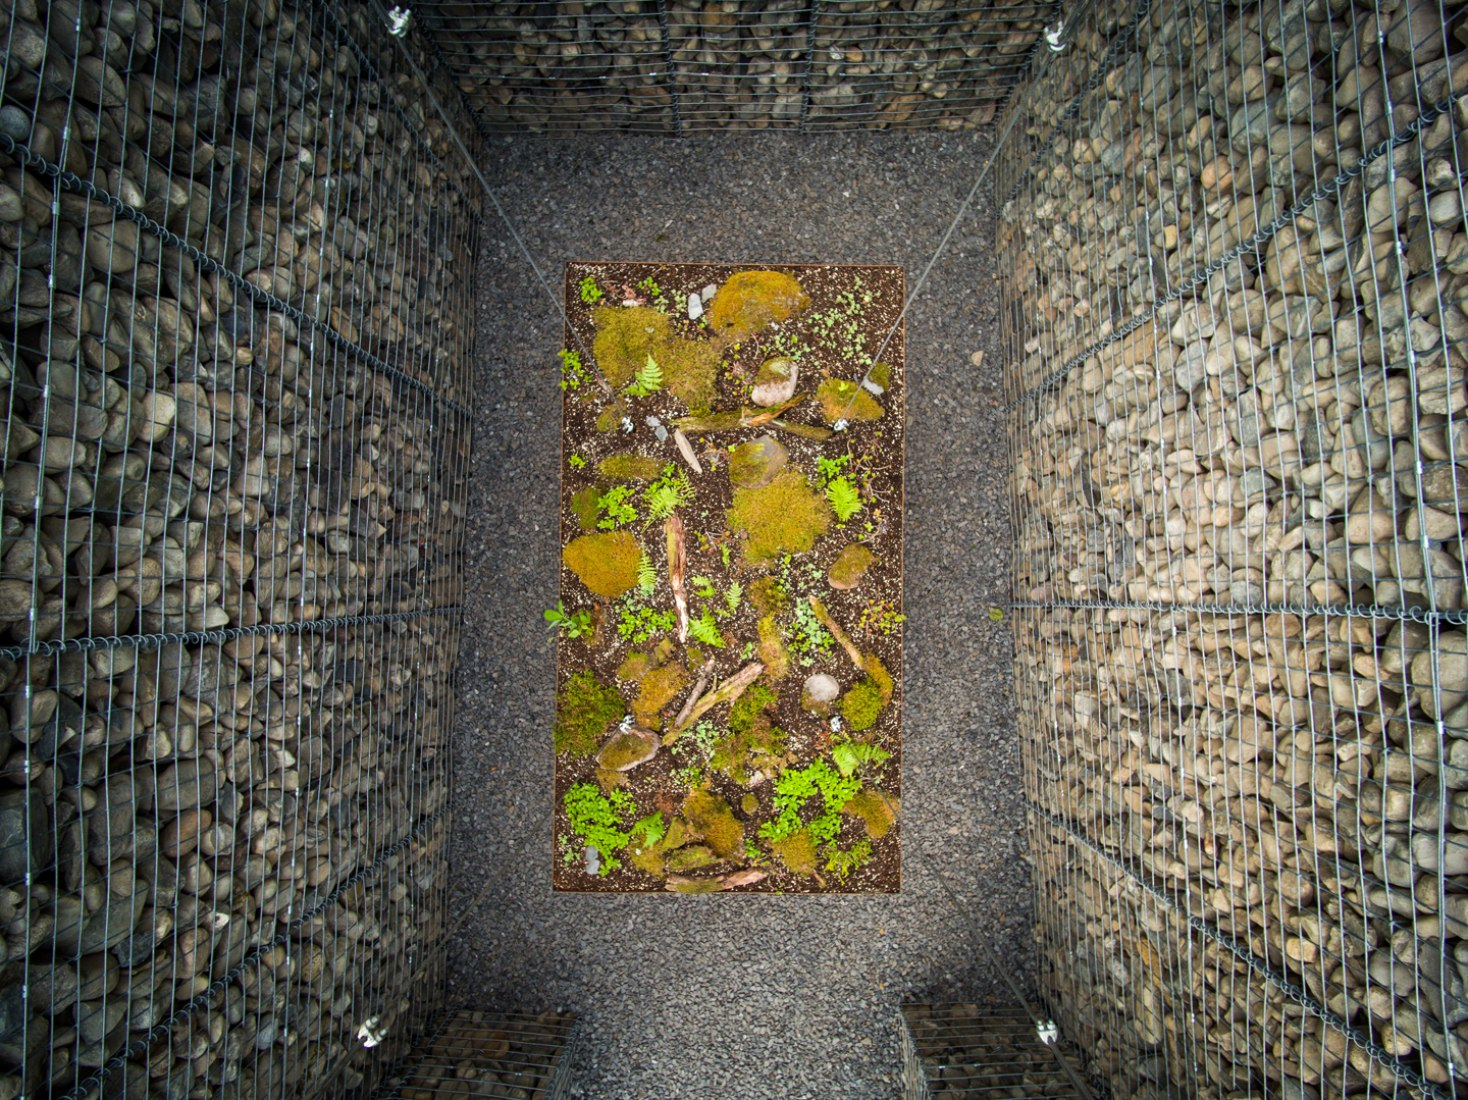 17th International Garden Festival. LE CAVEAU por Christian Poules de Basel, Switzerland.  Fotografía © Martin Bond.  Imagen cortesía de v2com.